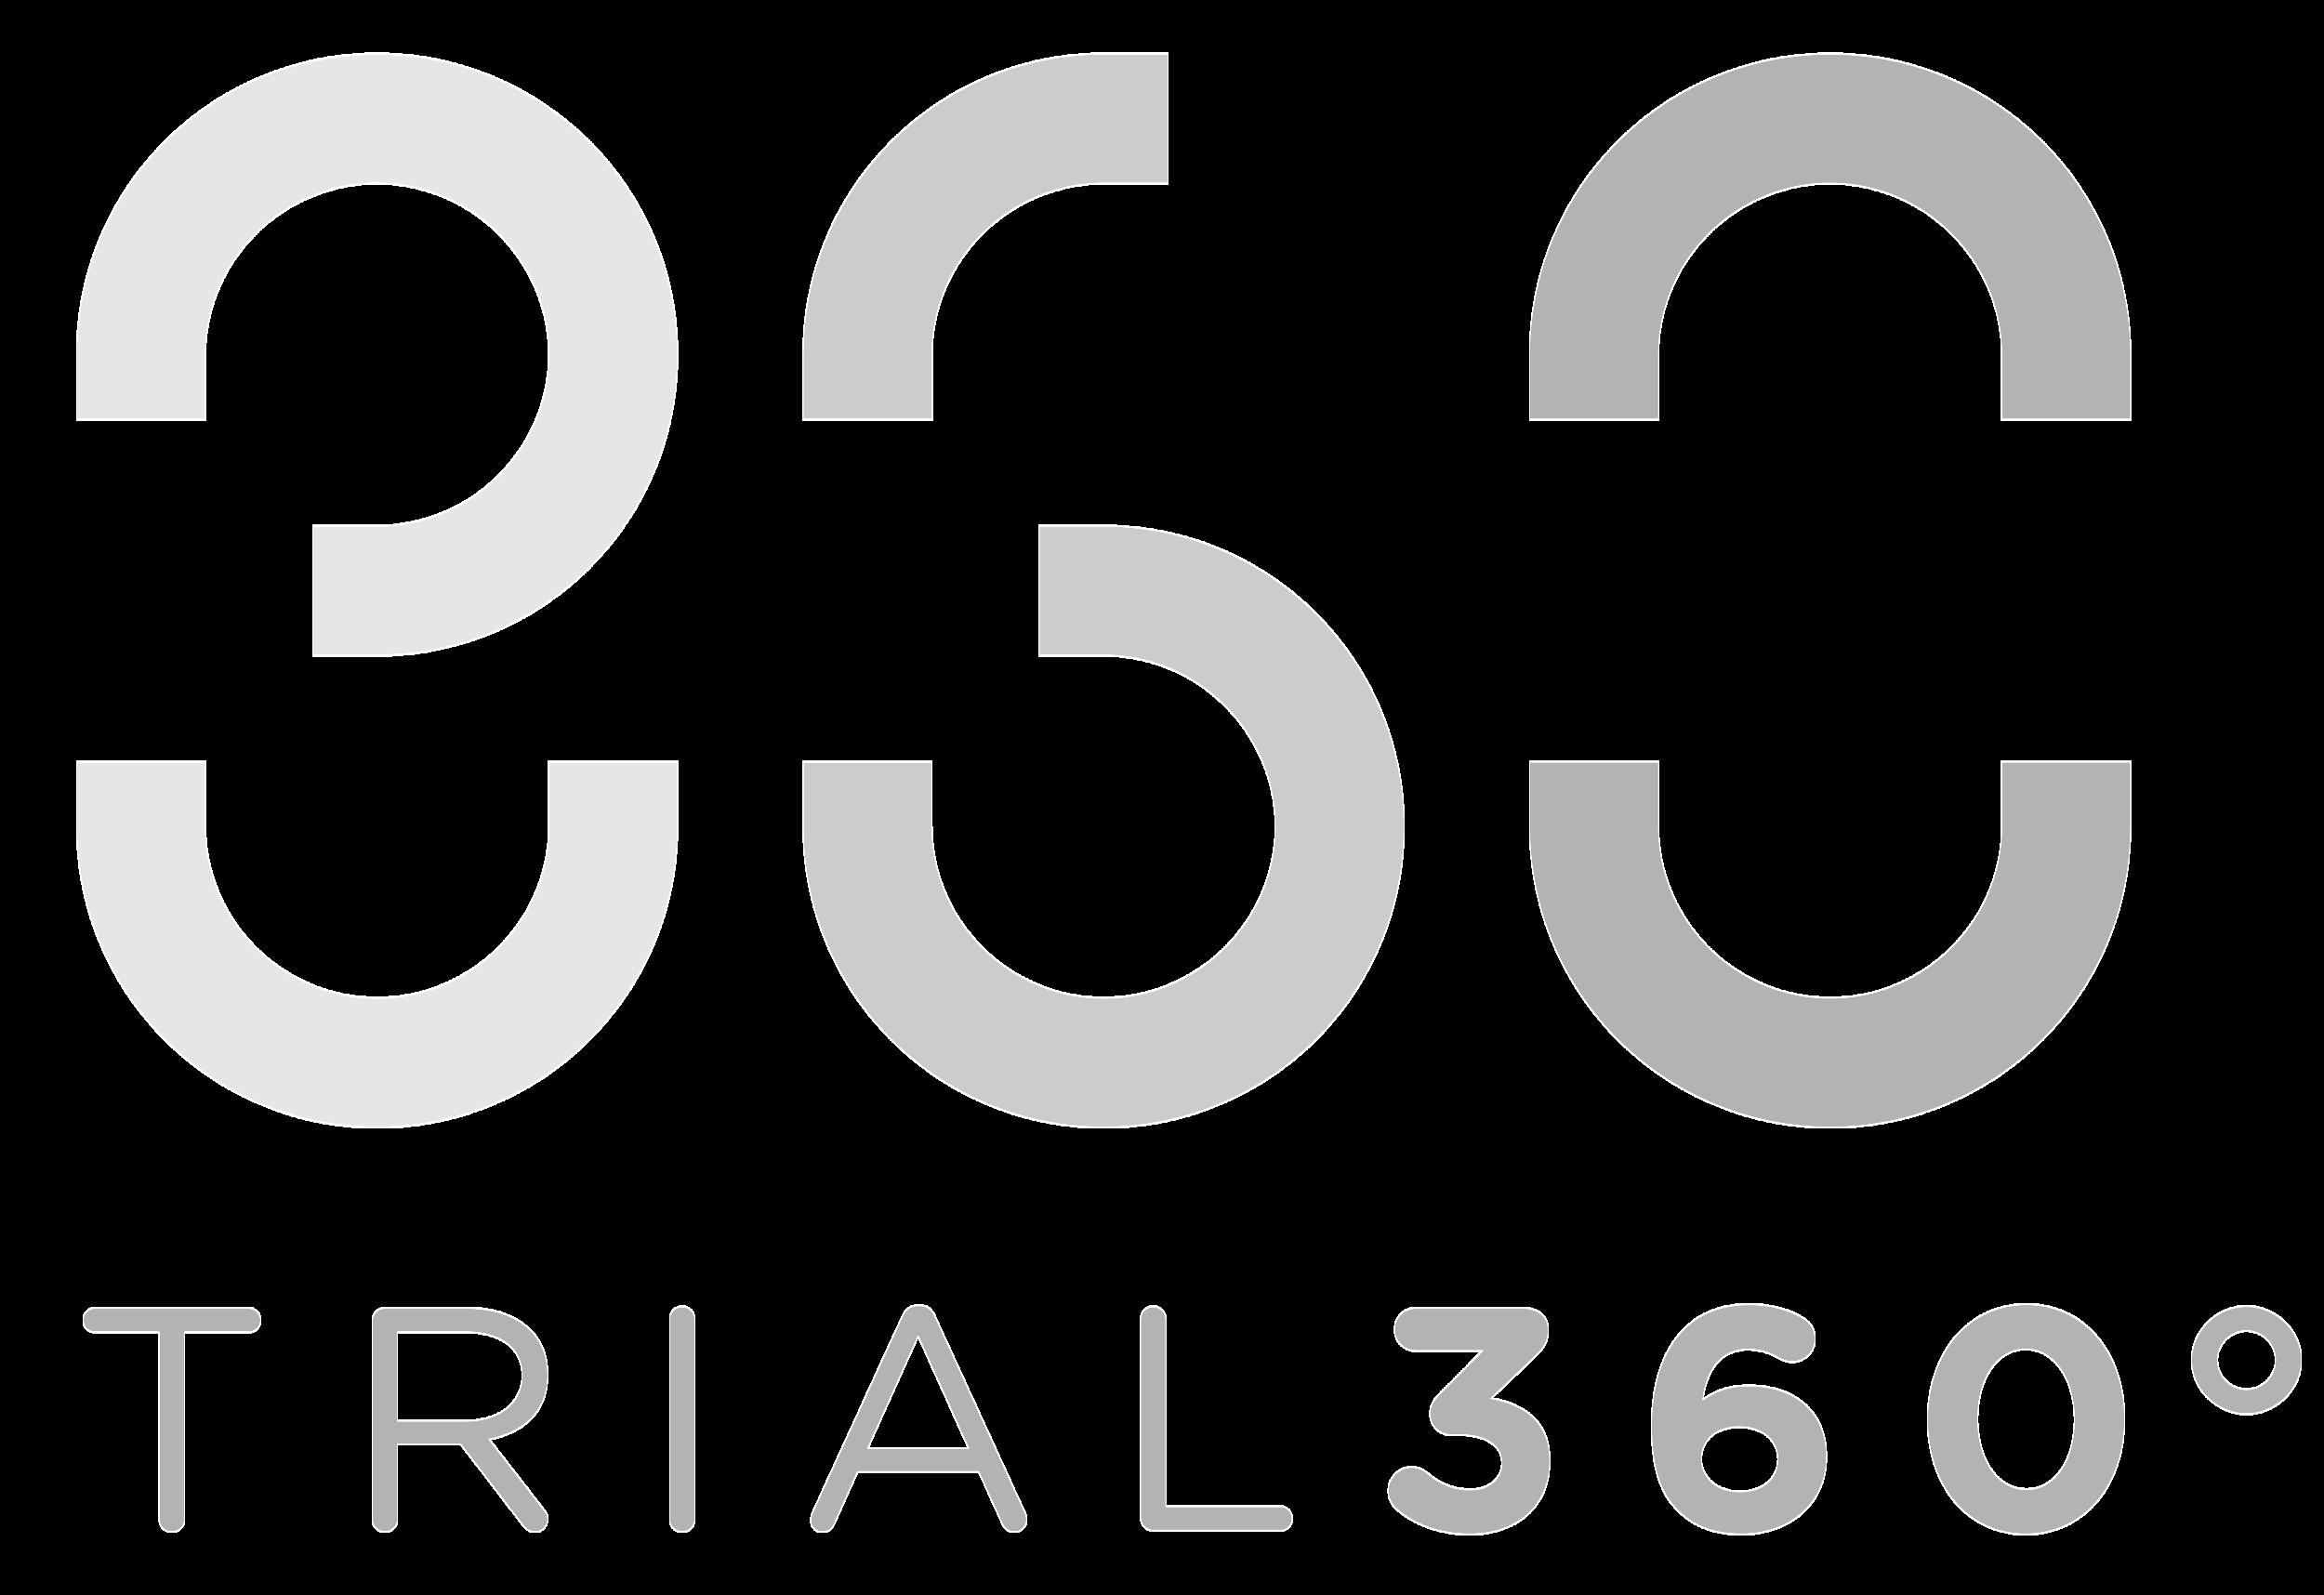 TRIAL 360